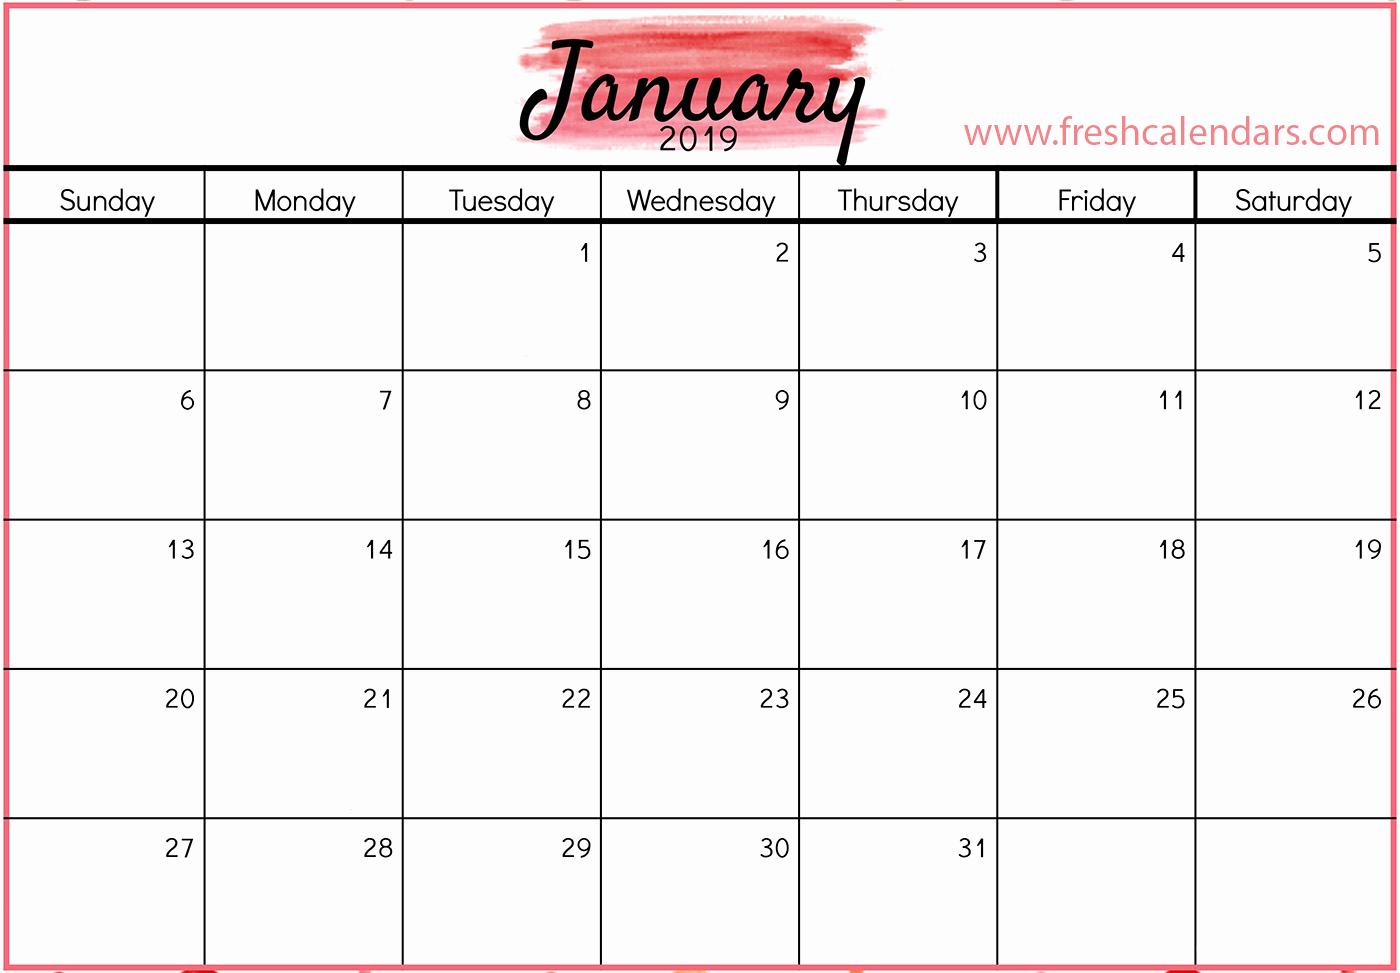 Monthly Calendar Template 2019 Inspirational January 2019 Calendar Printable Fresh Calendars